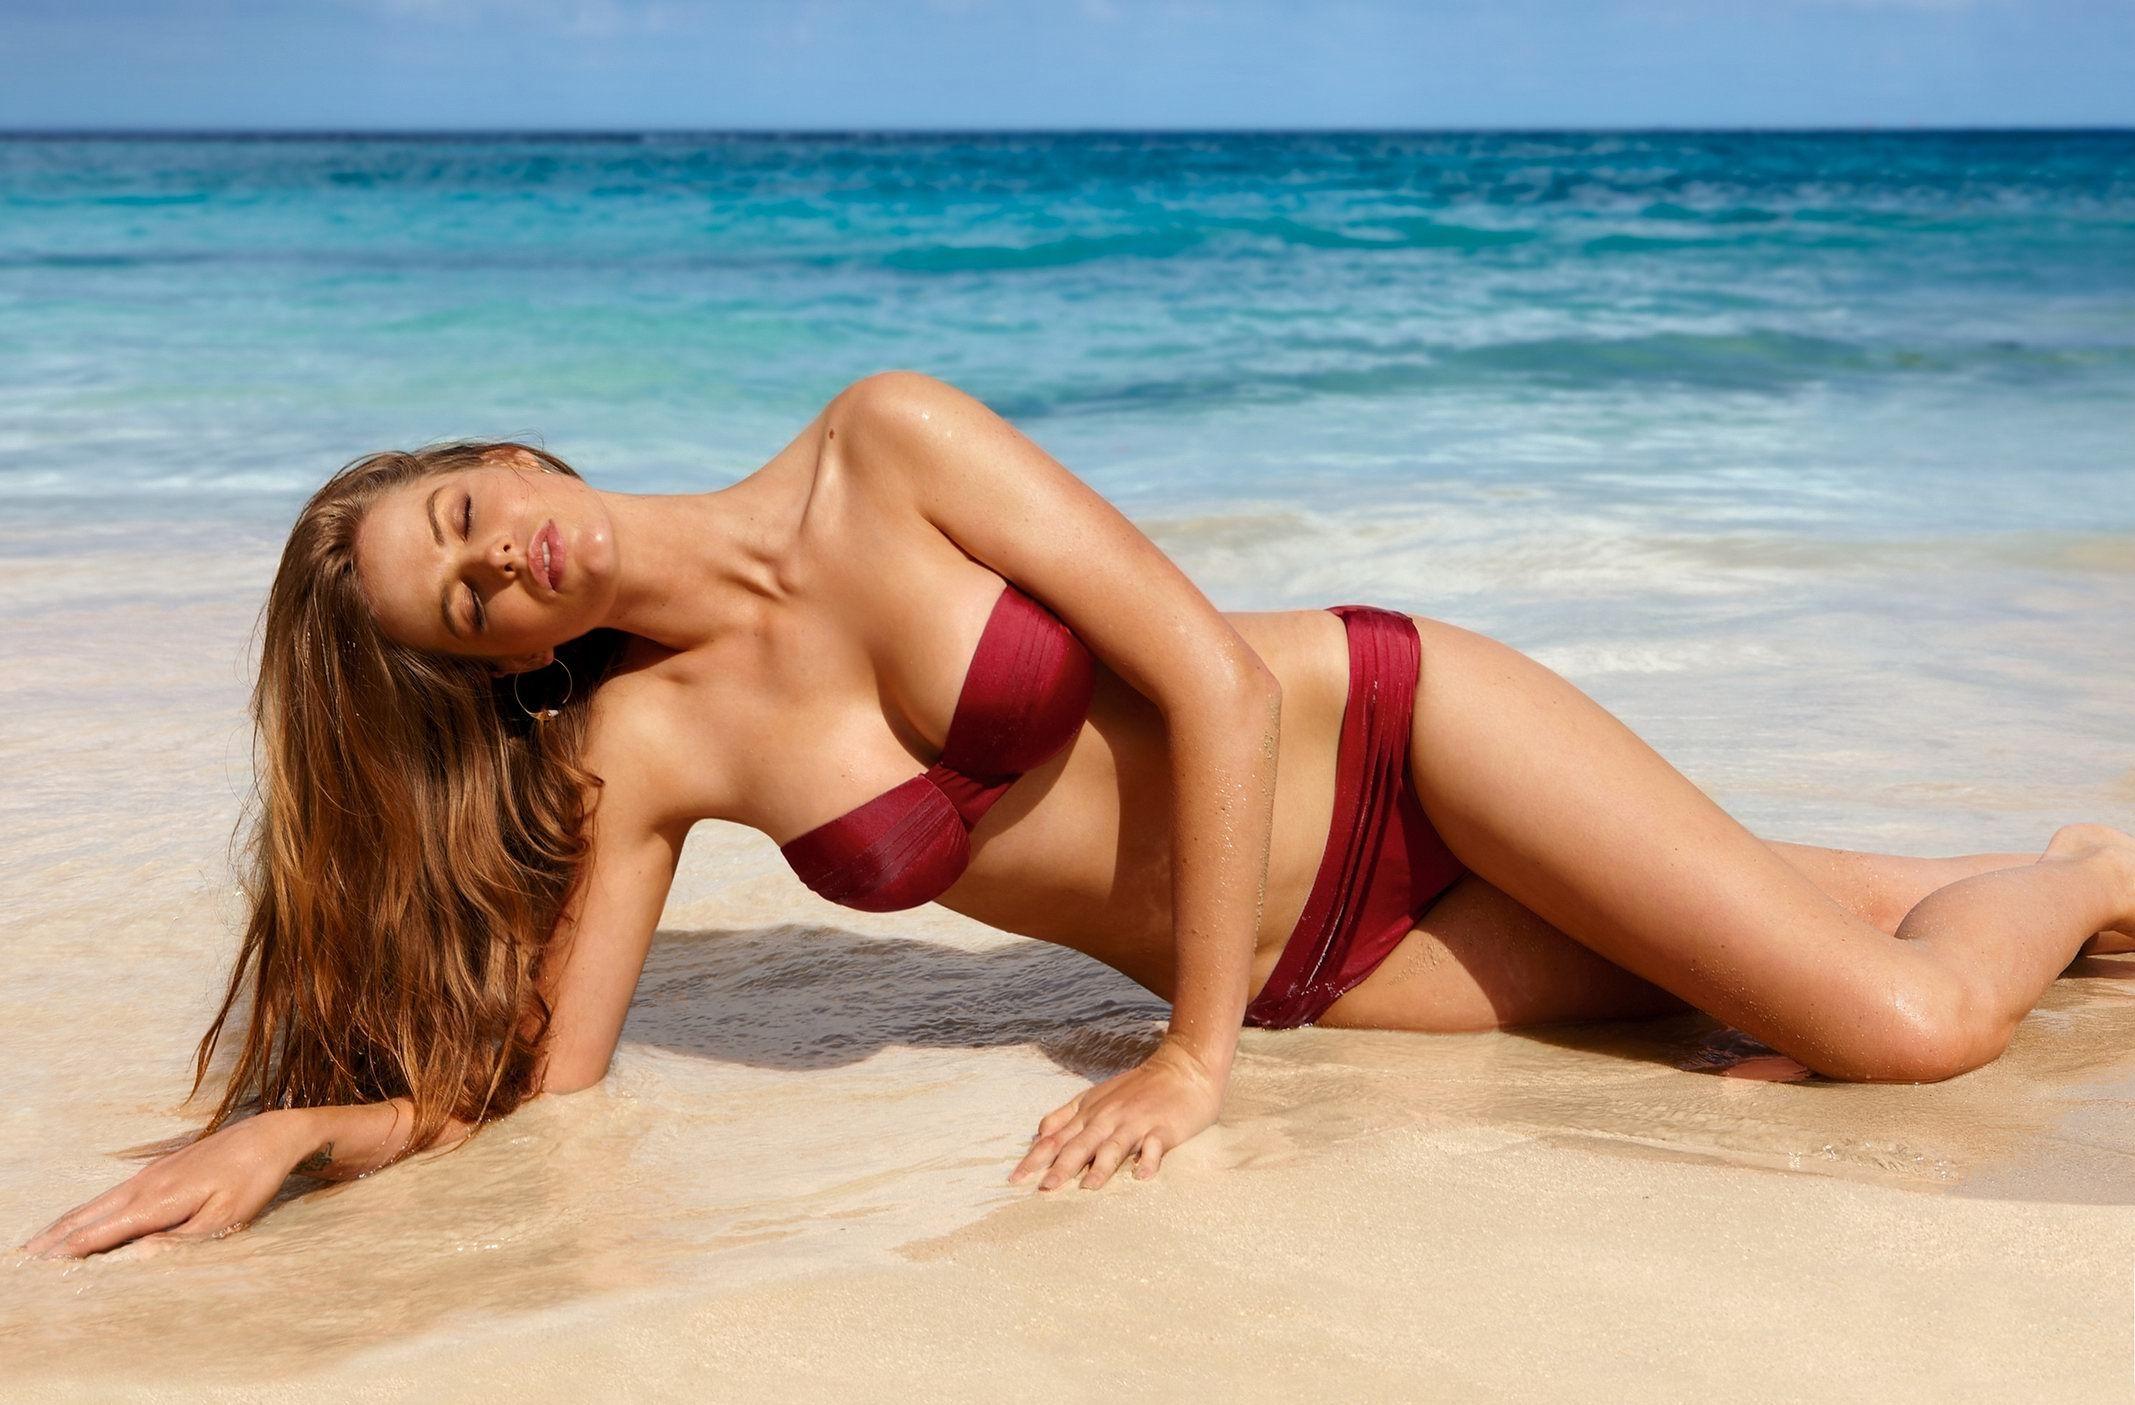 Lesbian bikini model beach pictures bening nude